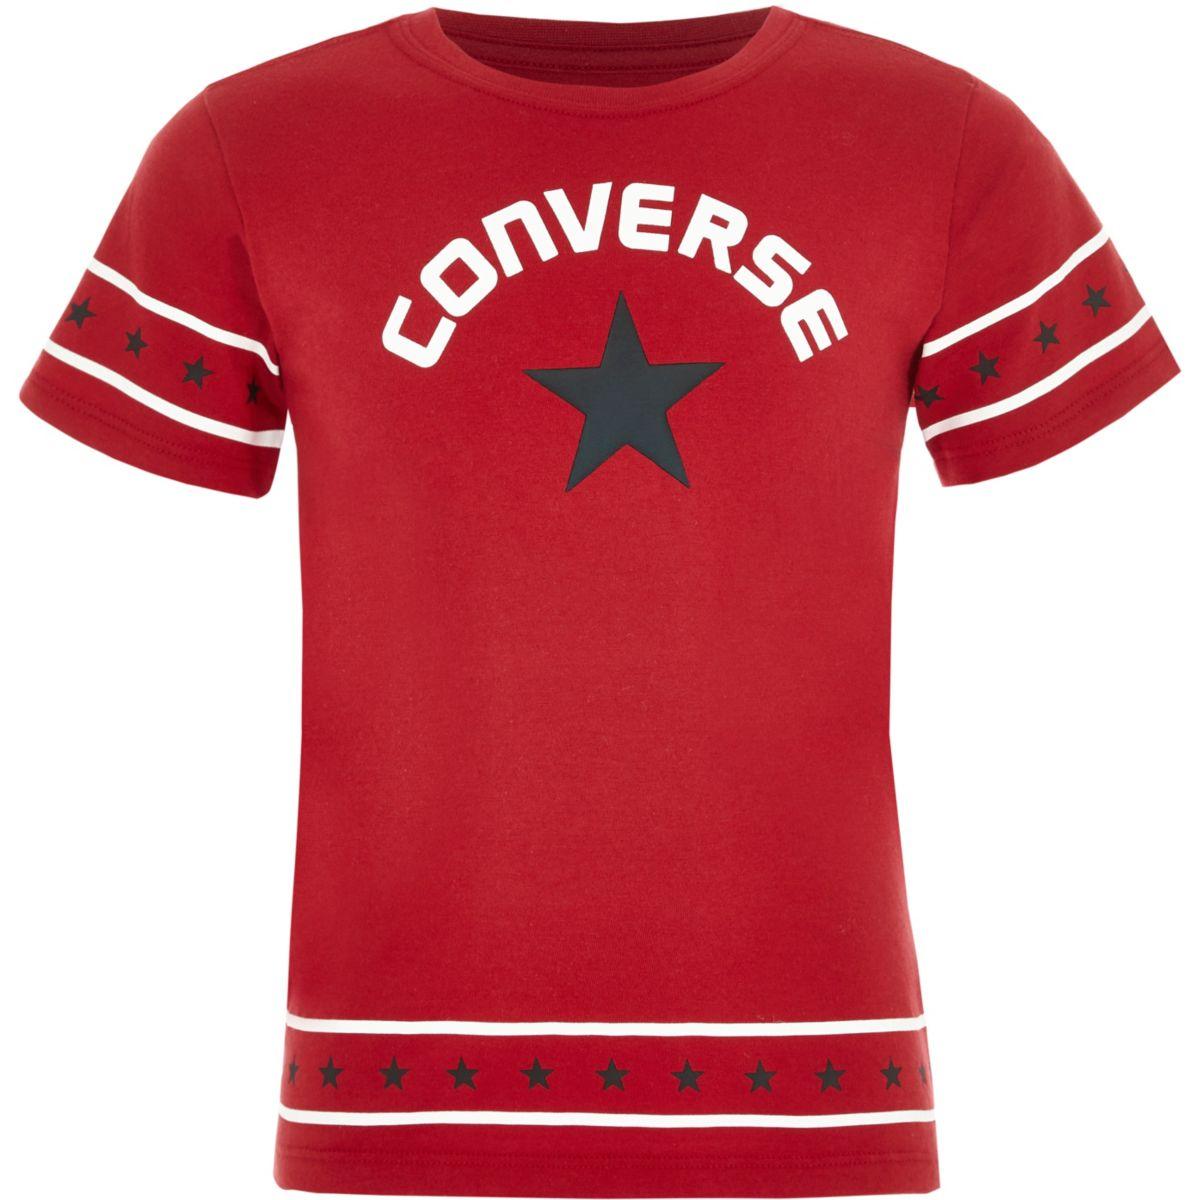 Girls Red Converse Star Trim T Shirt T Shirts Tops Girls